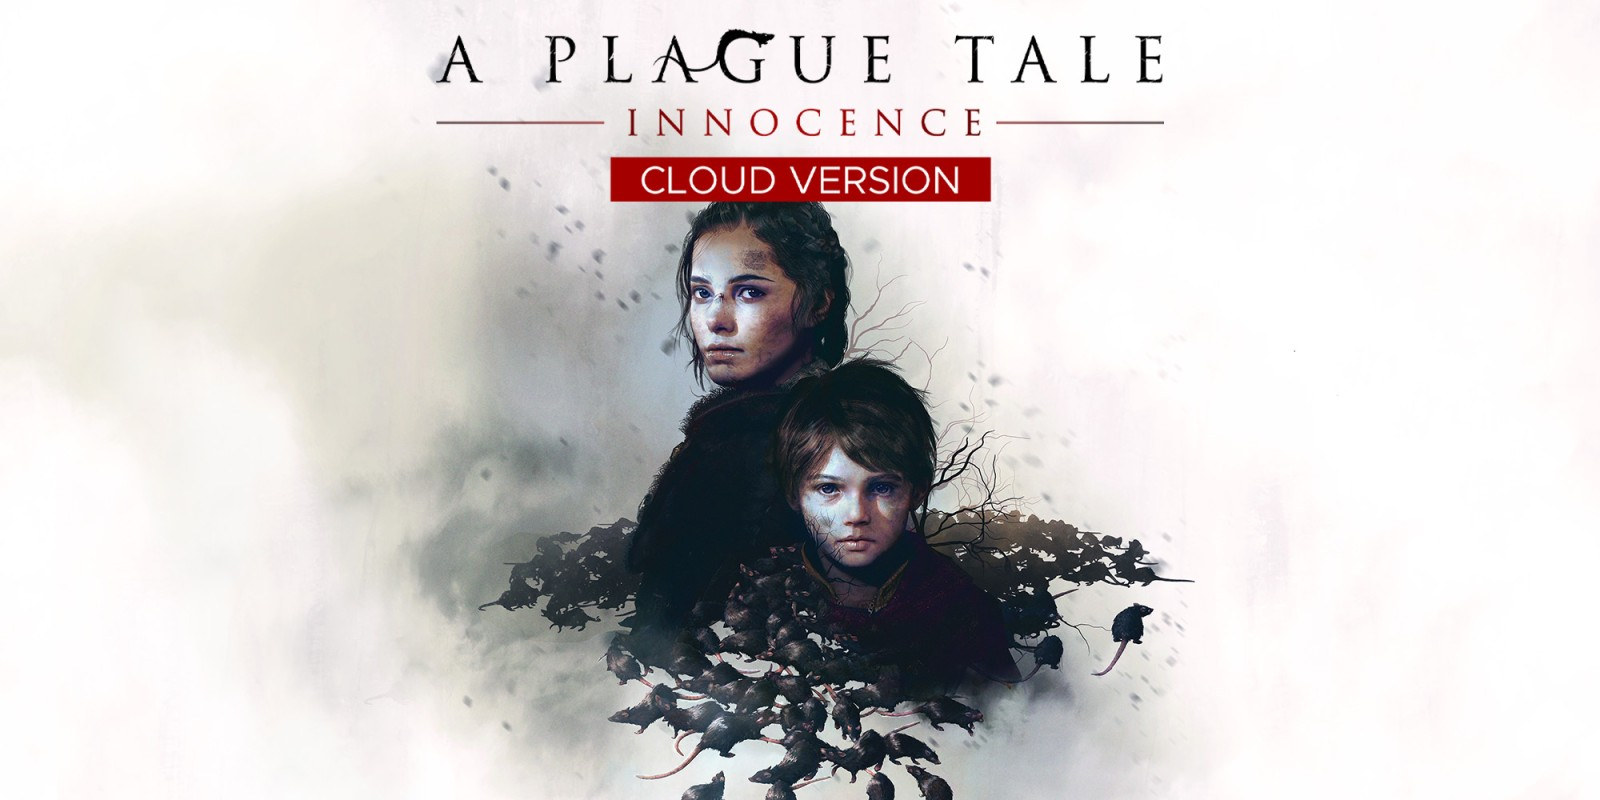 A Plague Tale: Innocence - Cloud Version